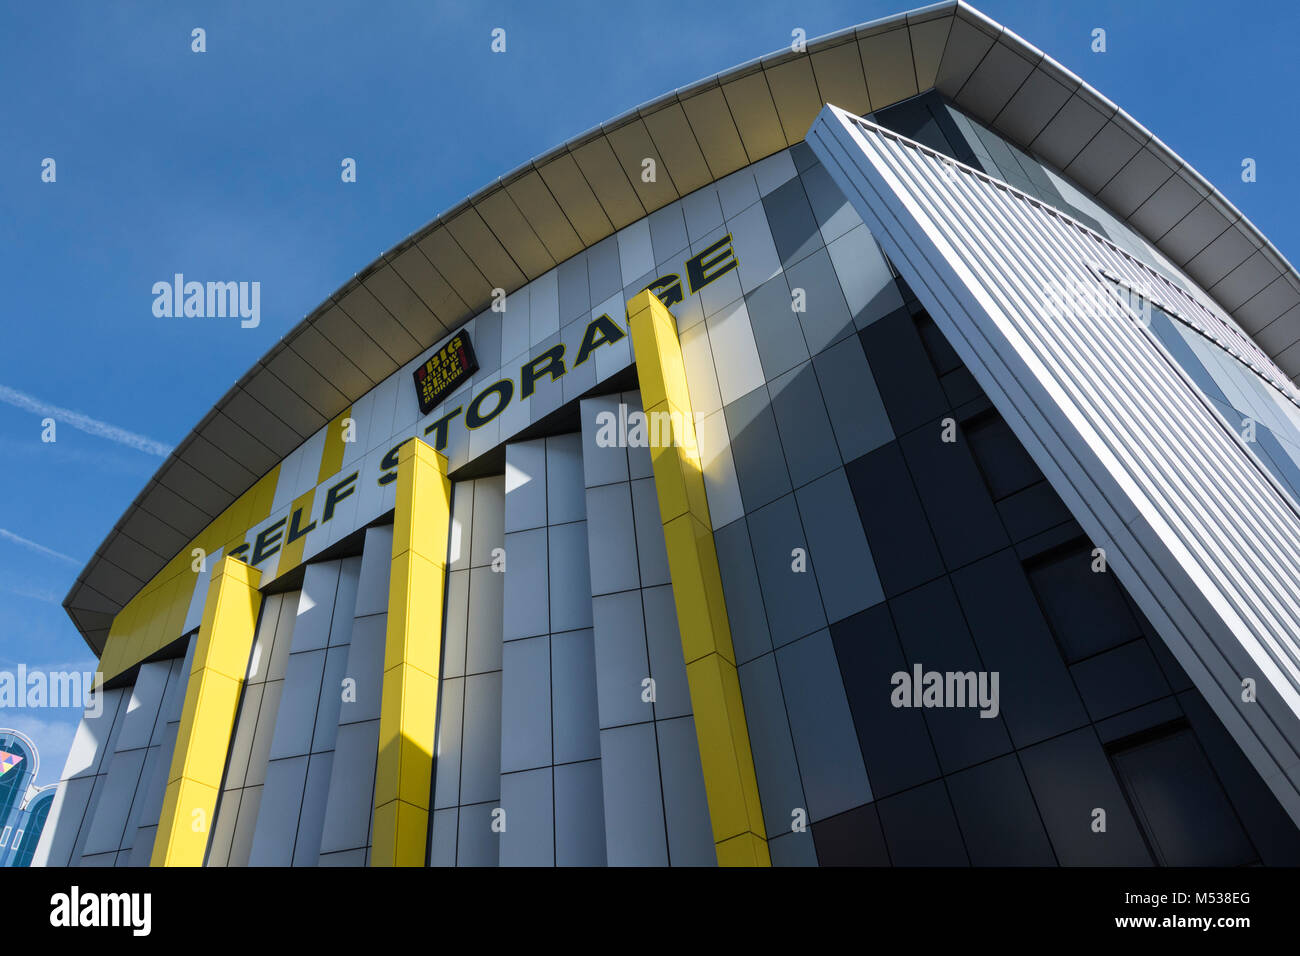 Big Yellow Self Storage warehouse facility in Brentford, west London, UK - Stock Image